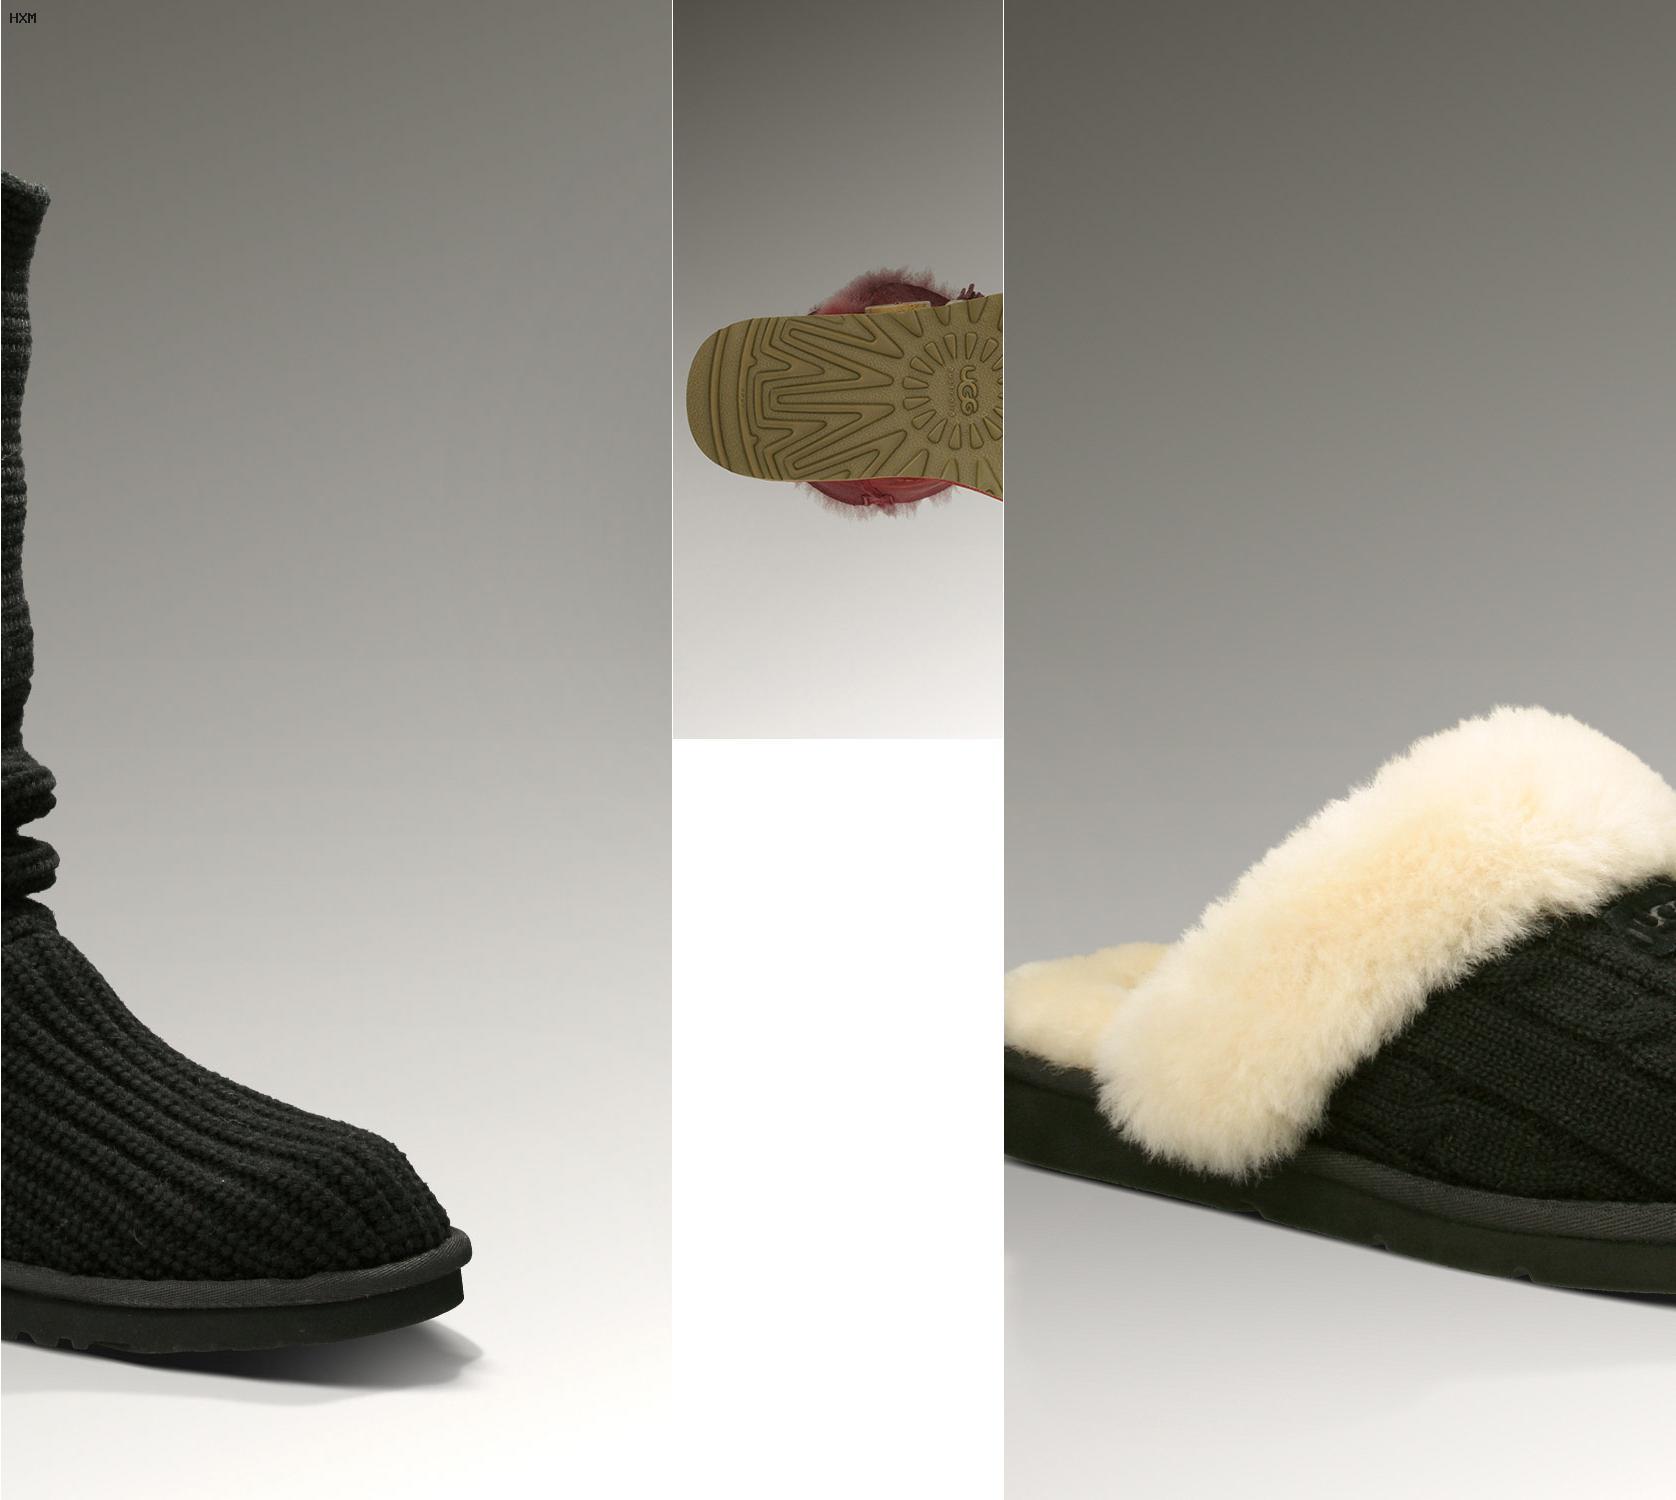 ugg boots bailey button schwarz sale. Black Bedroom Furniture Sets. Home Design Ideas